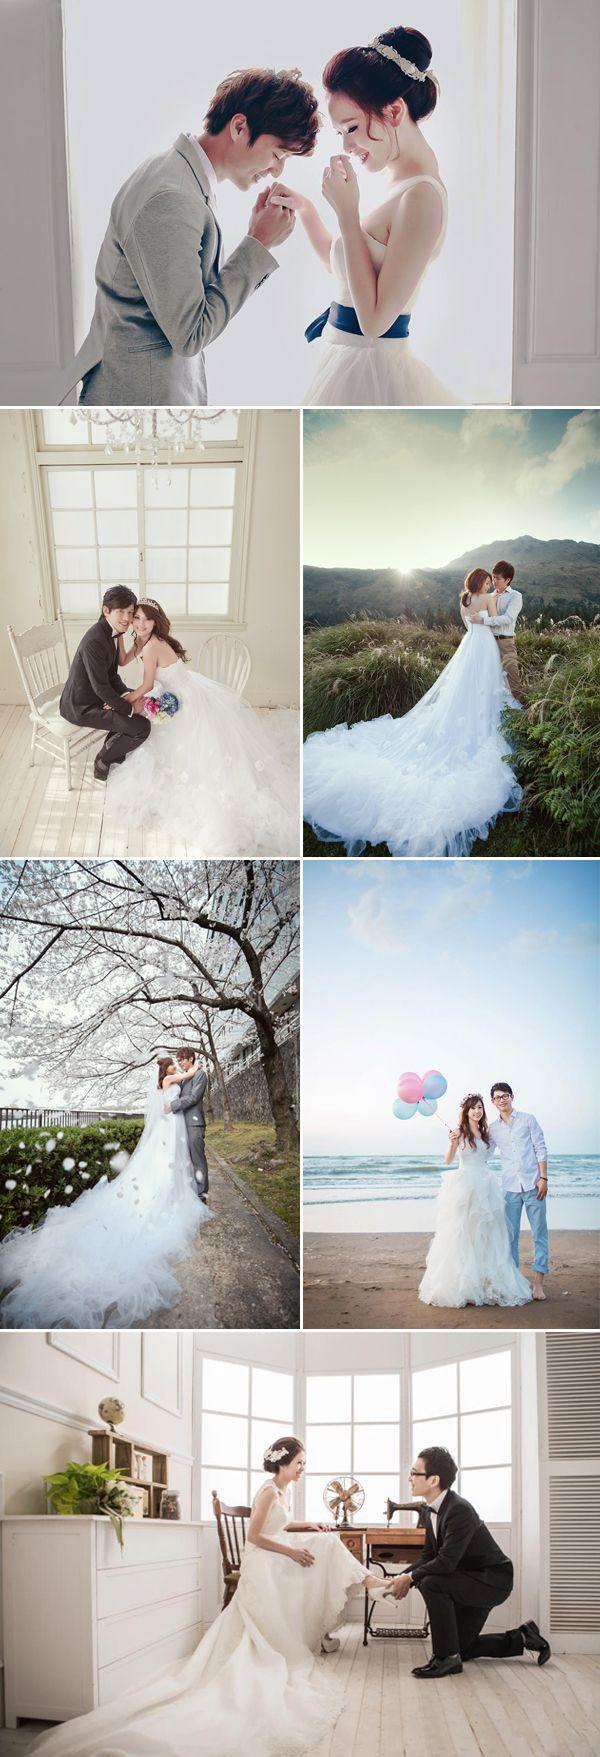 Diosa bridal dress wedding dress pinterest pre wedding photo